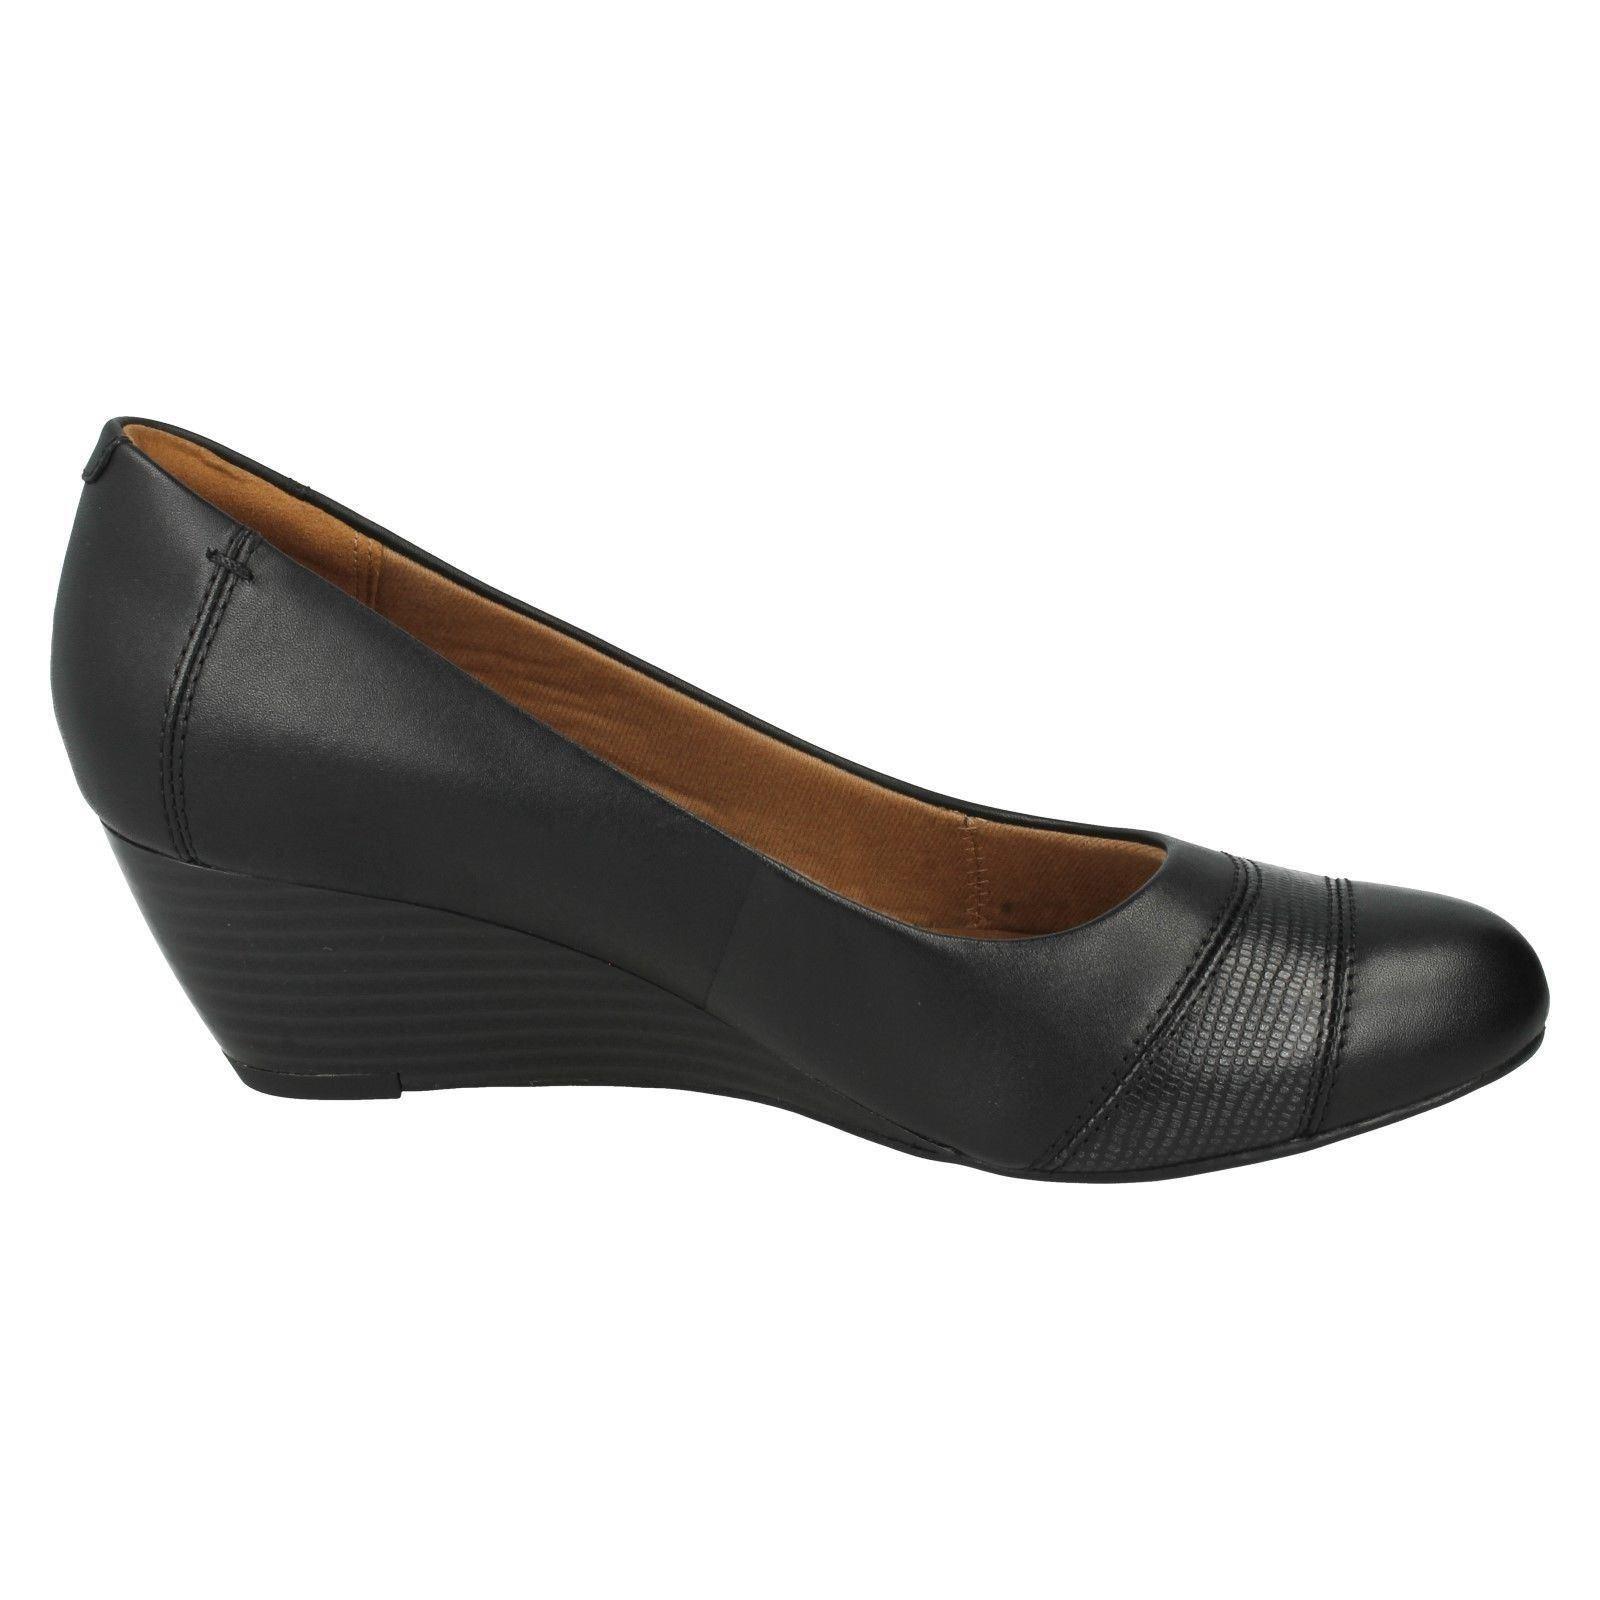 clarks smart wedge heeled shoes brielle tacha k